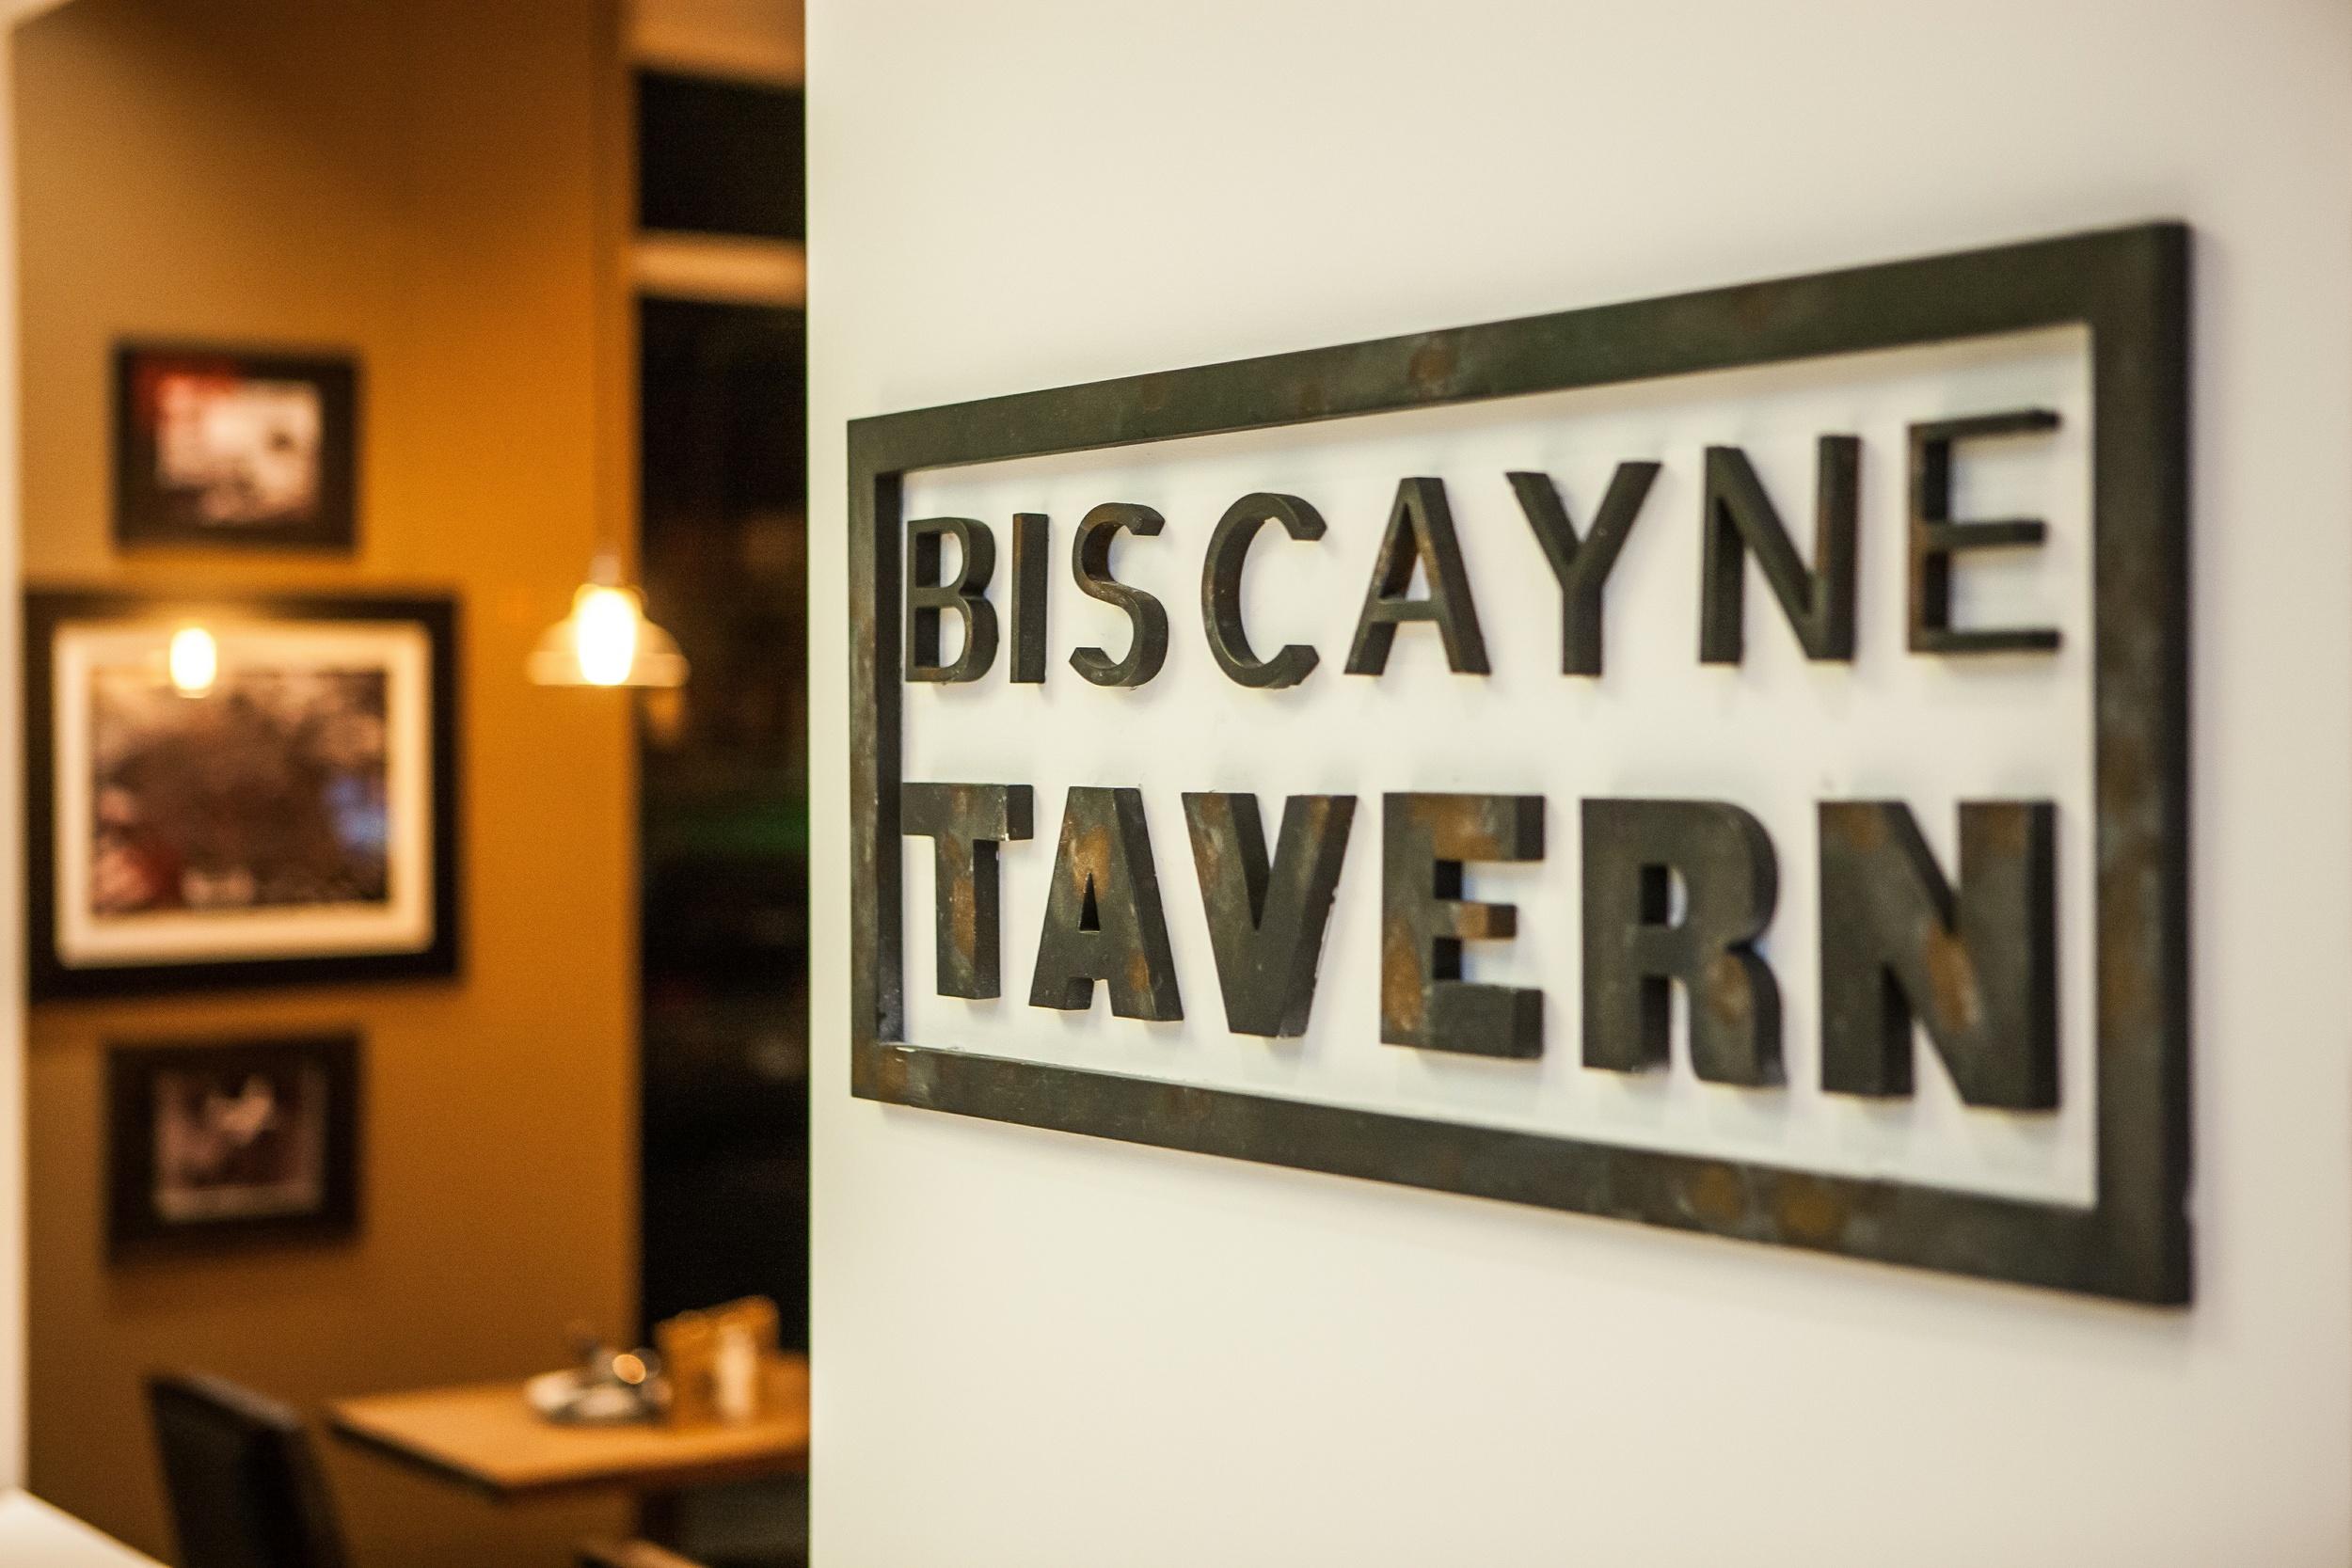 Biscayne Tavern Sign.jpg